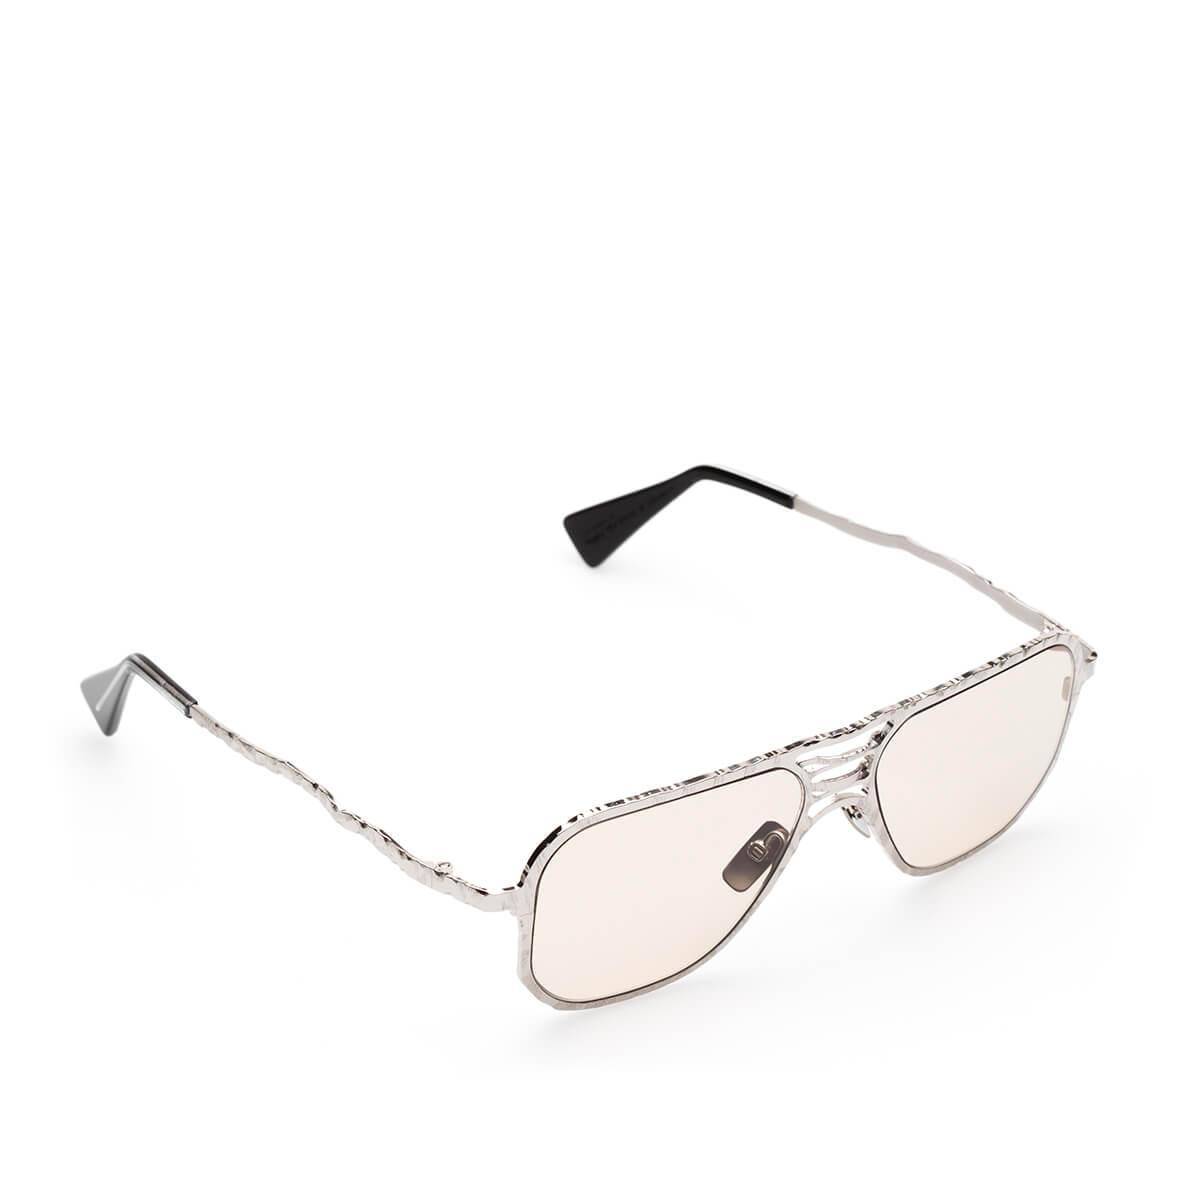 Kuboraum H54 Si Sunglasses in Silver (Metallic) for Men